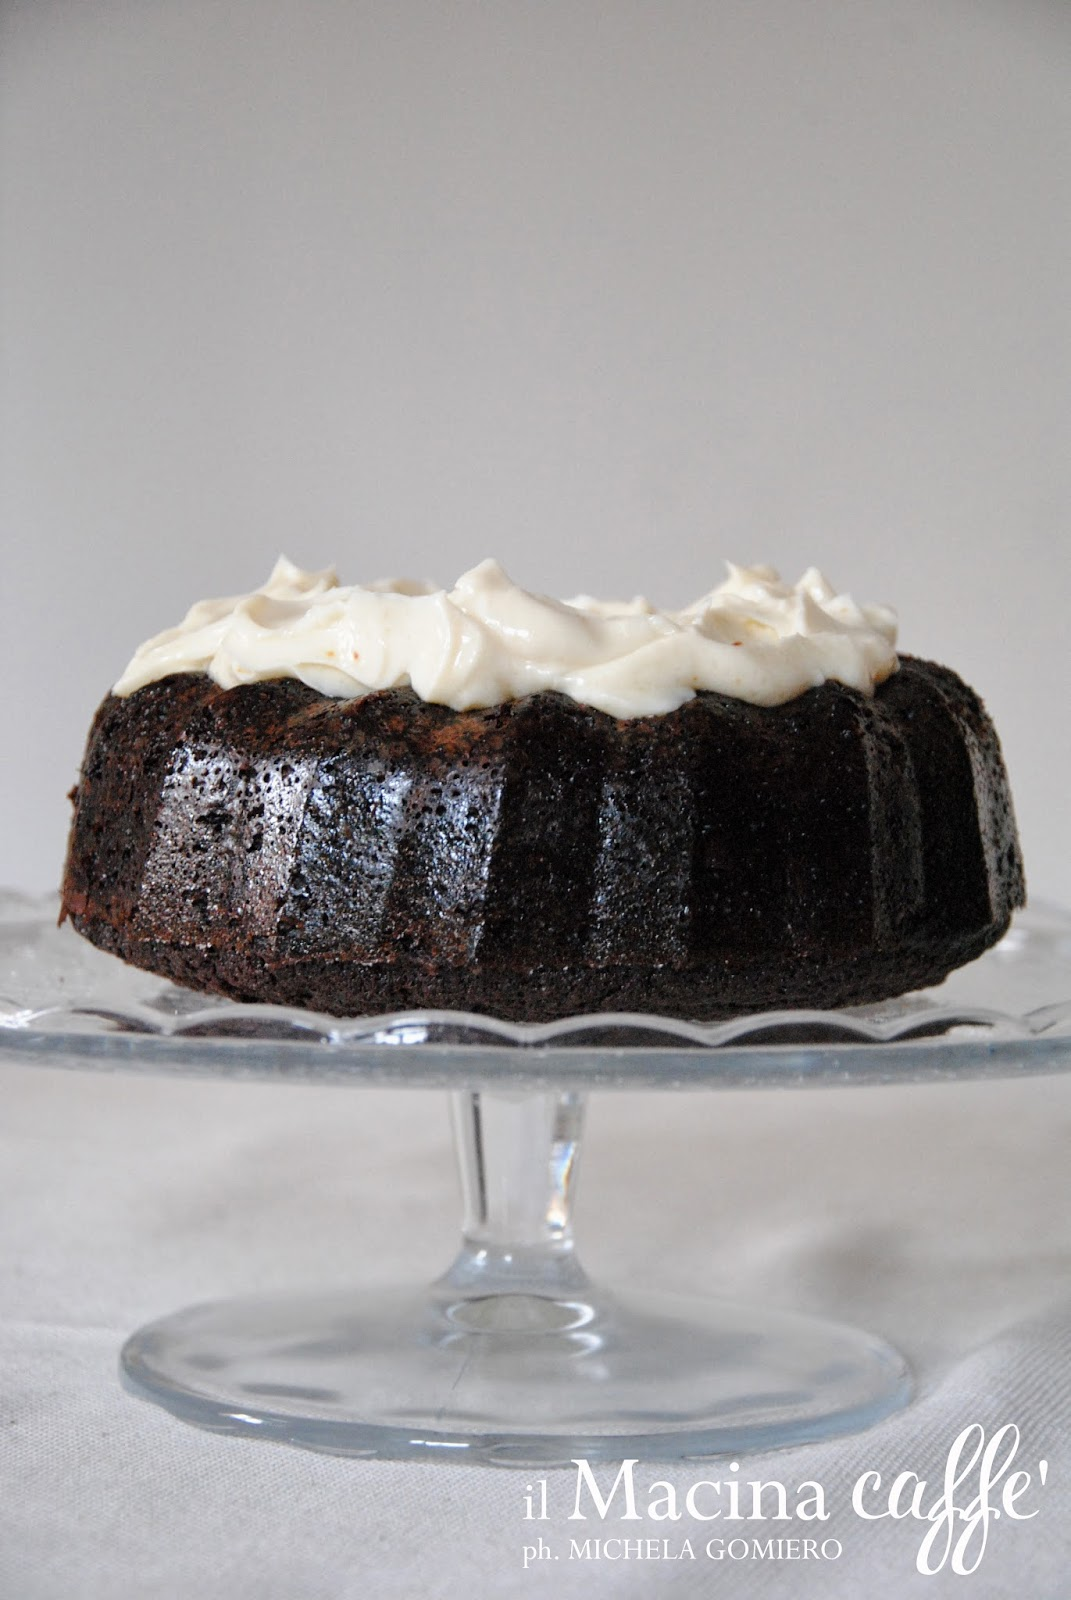 il Macina Caffè: Guinness chocolate cake